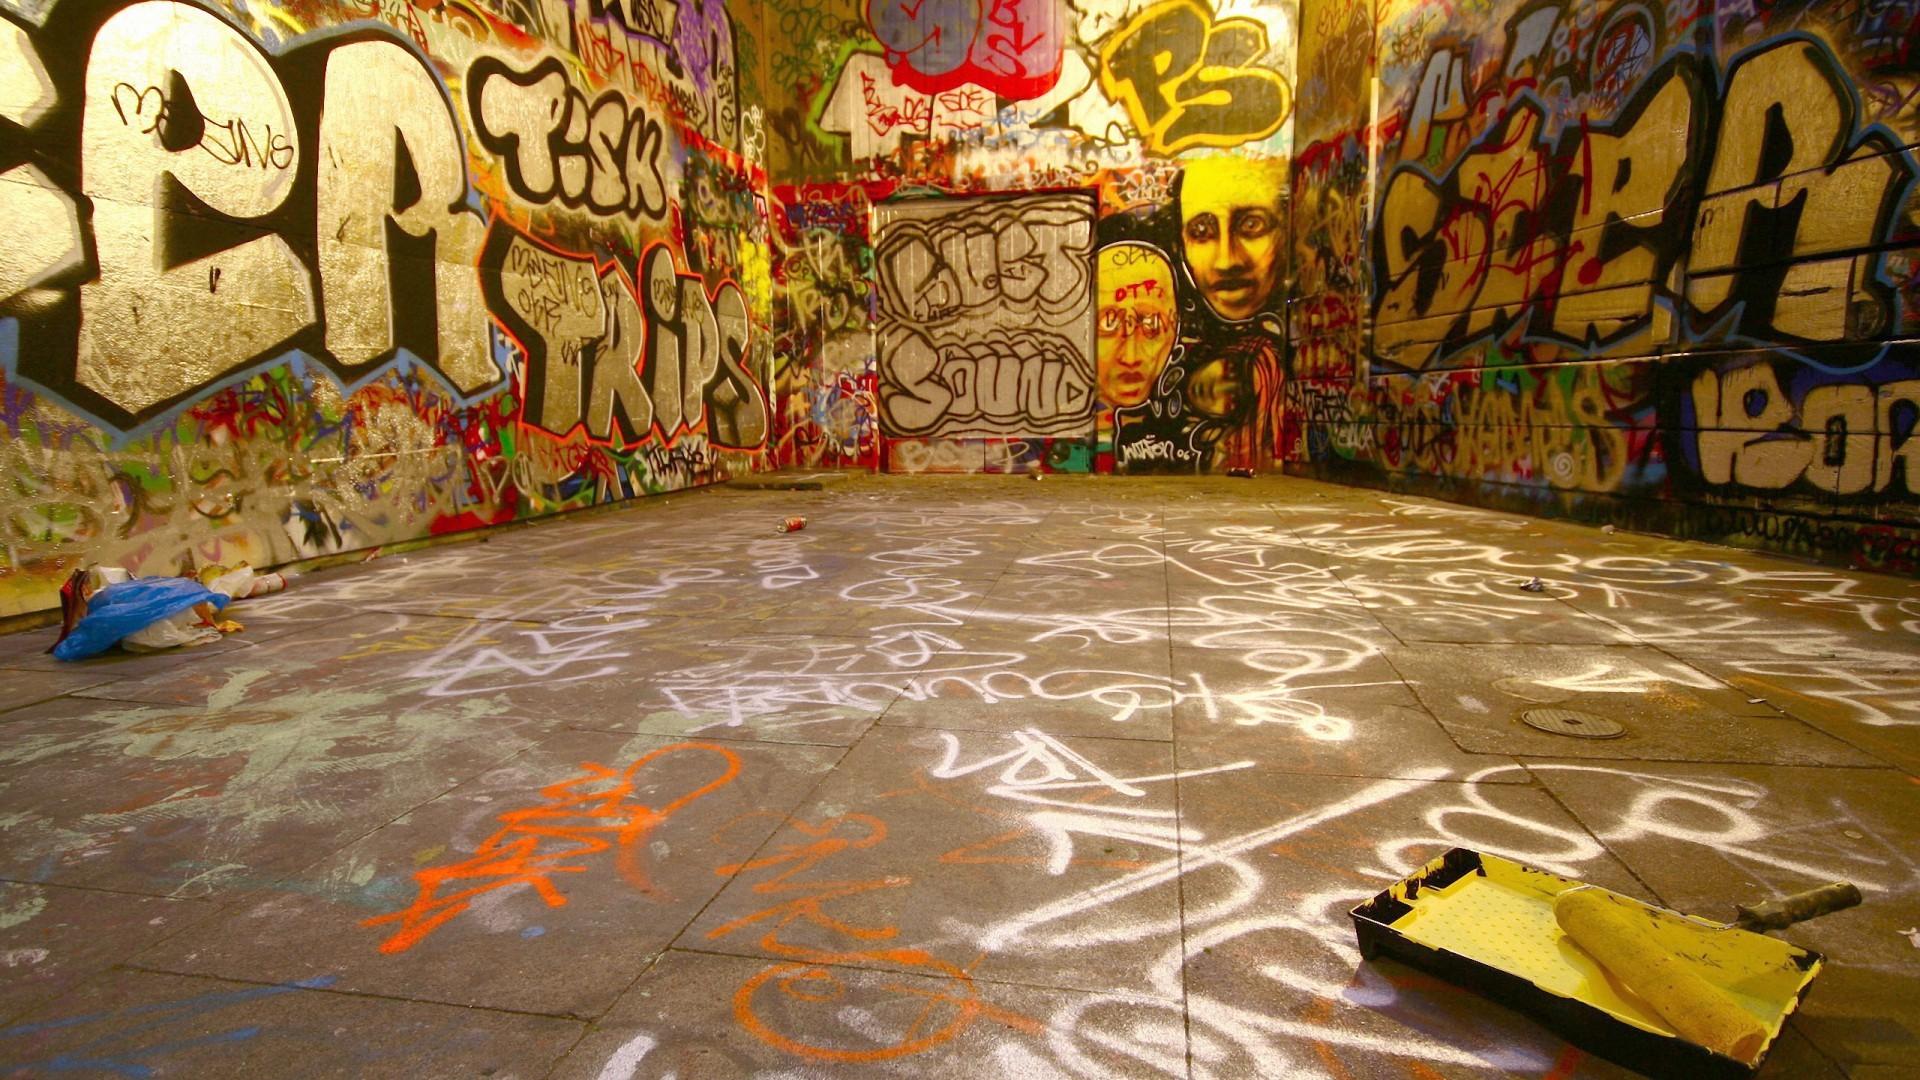 Jdm Car Wallpaper 1920x1080 Hd Graffiti Desktop Wallpapers 71 Images